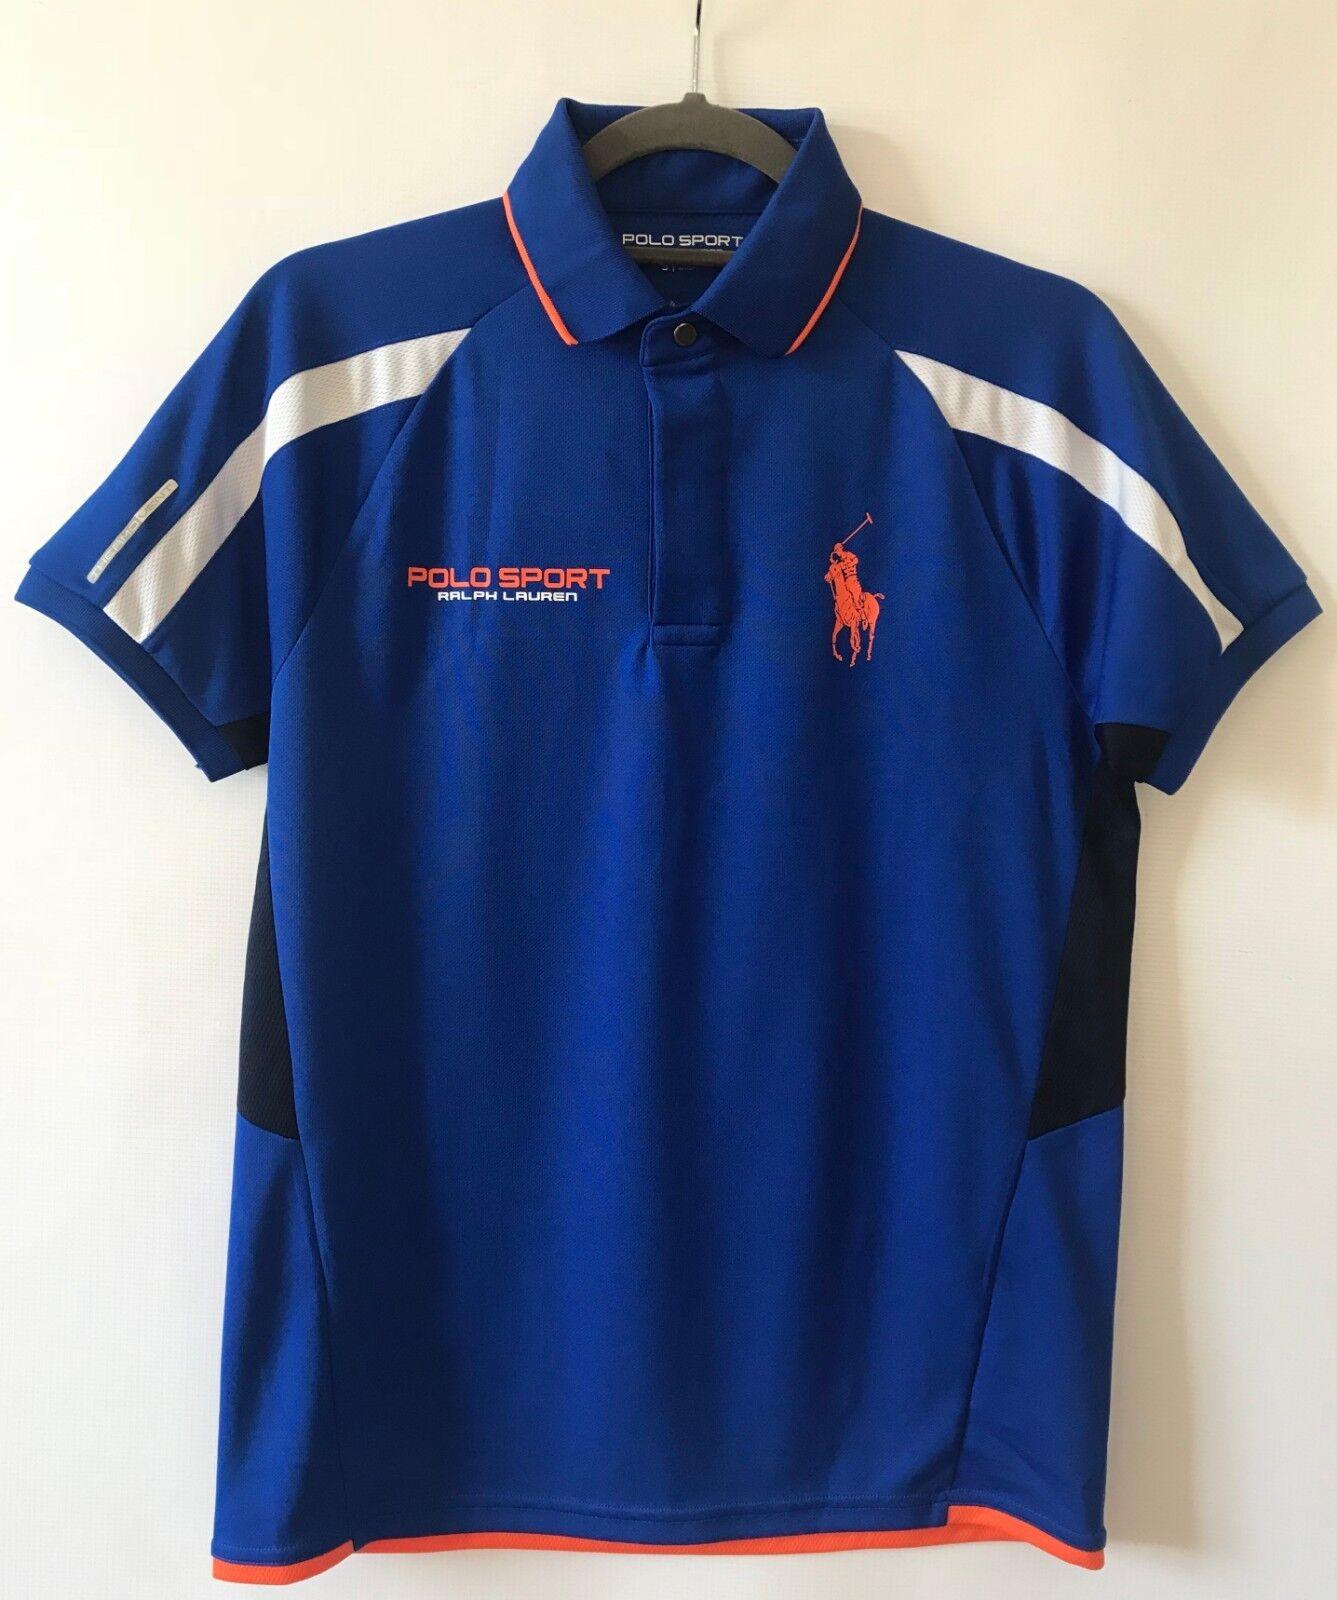 POLO RALPH LAUREN SPORT T-shirt, Blended Pique Mesh, Pacific Royal, size SMALL